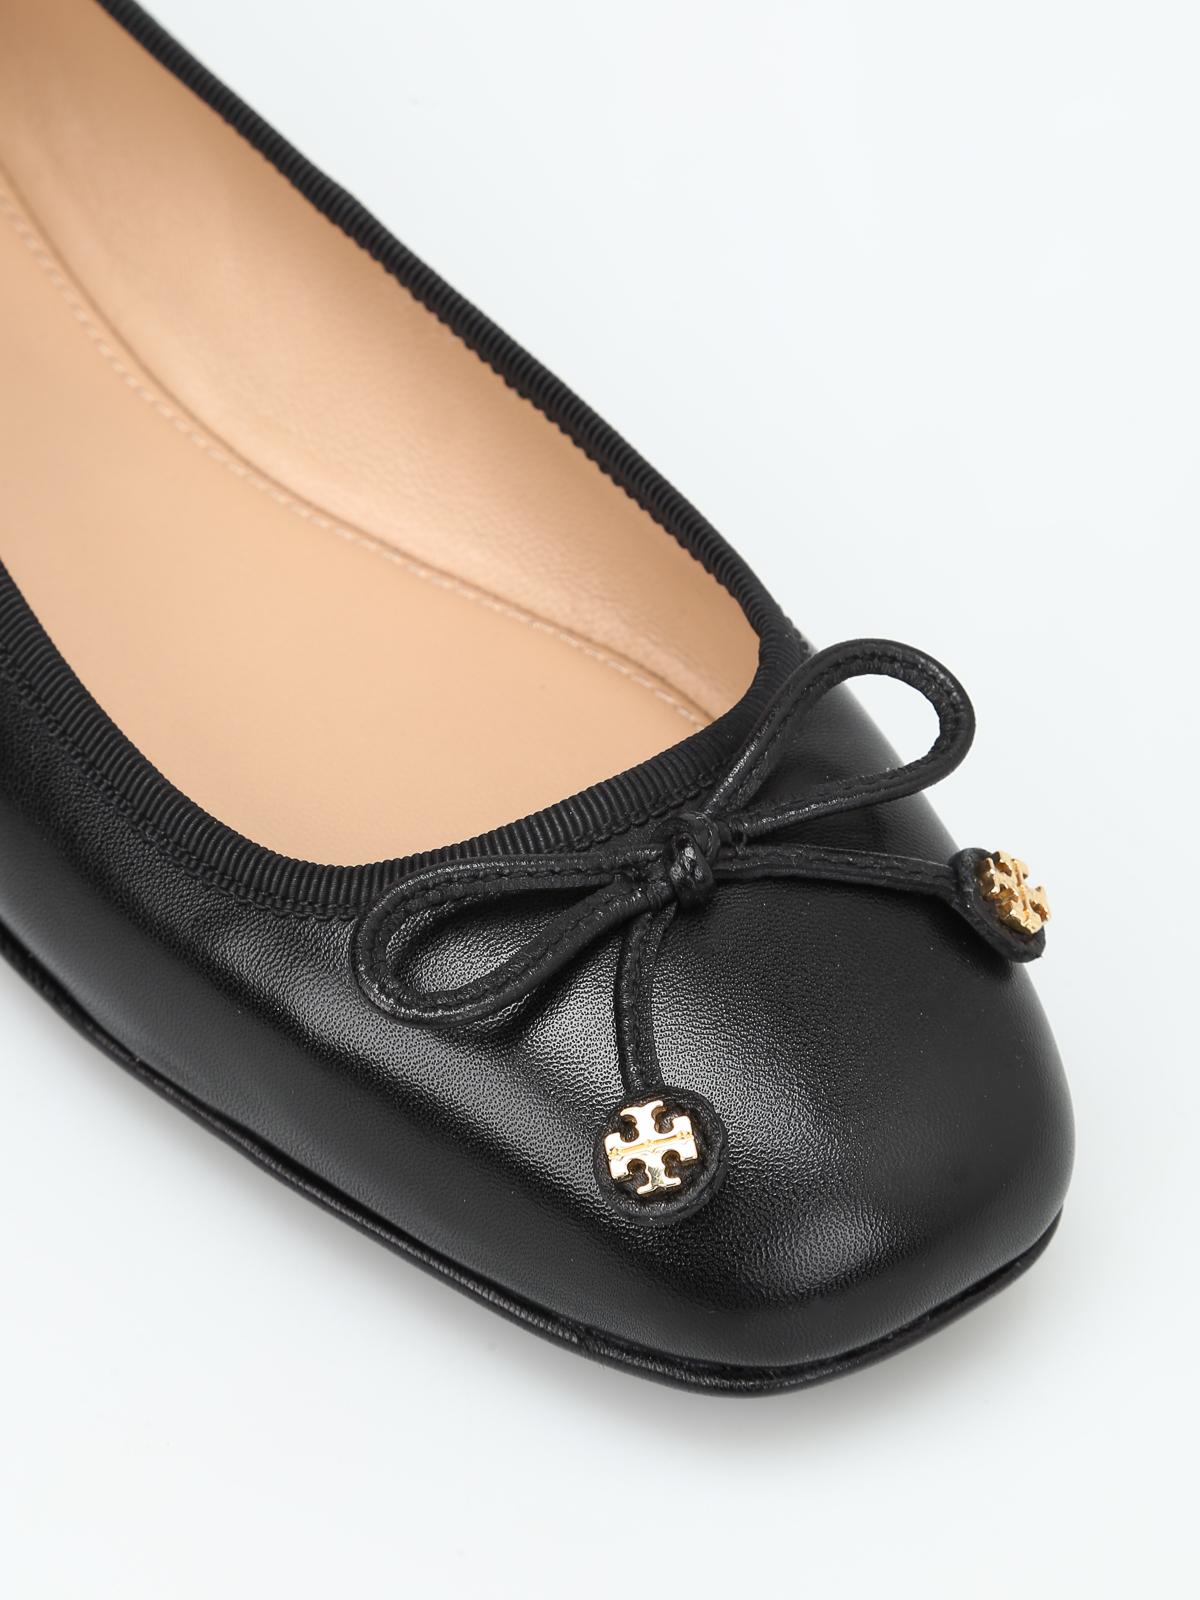 ec54b5c8bddc Tory Burch - Laila driver ballet flat - flat shoes - 36834 001 ...